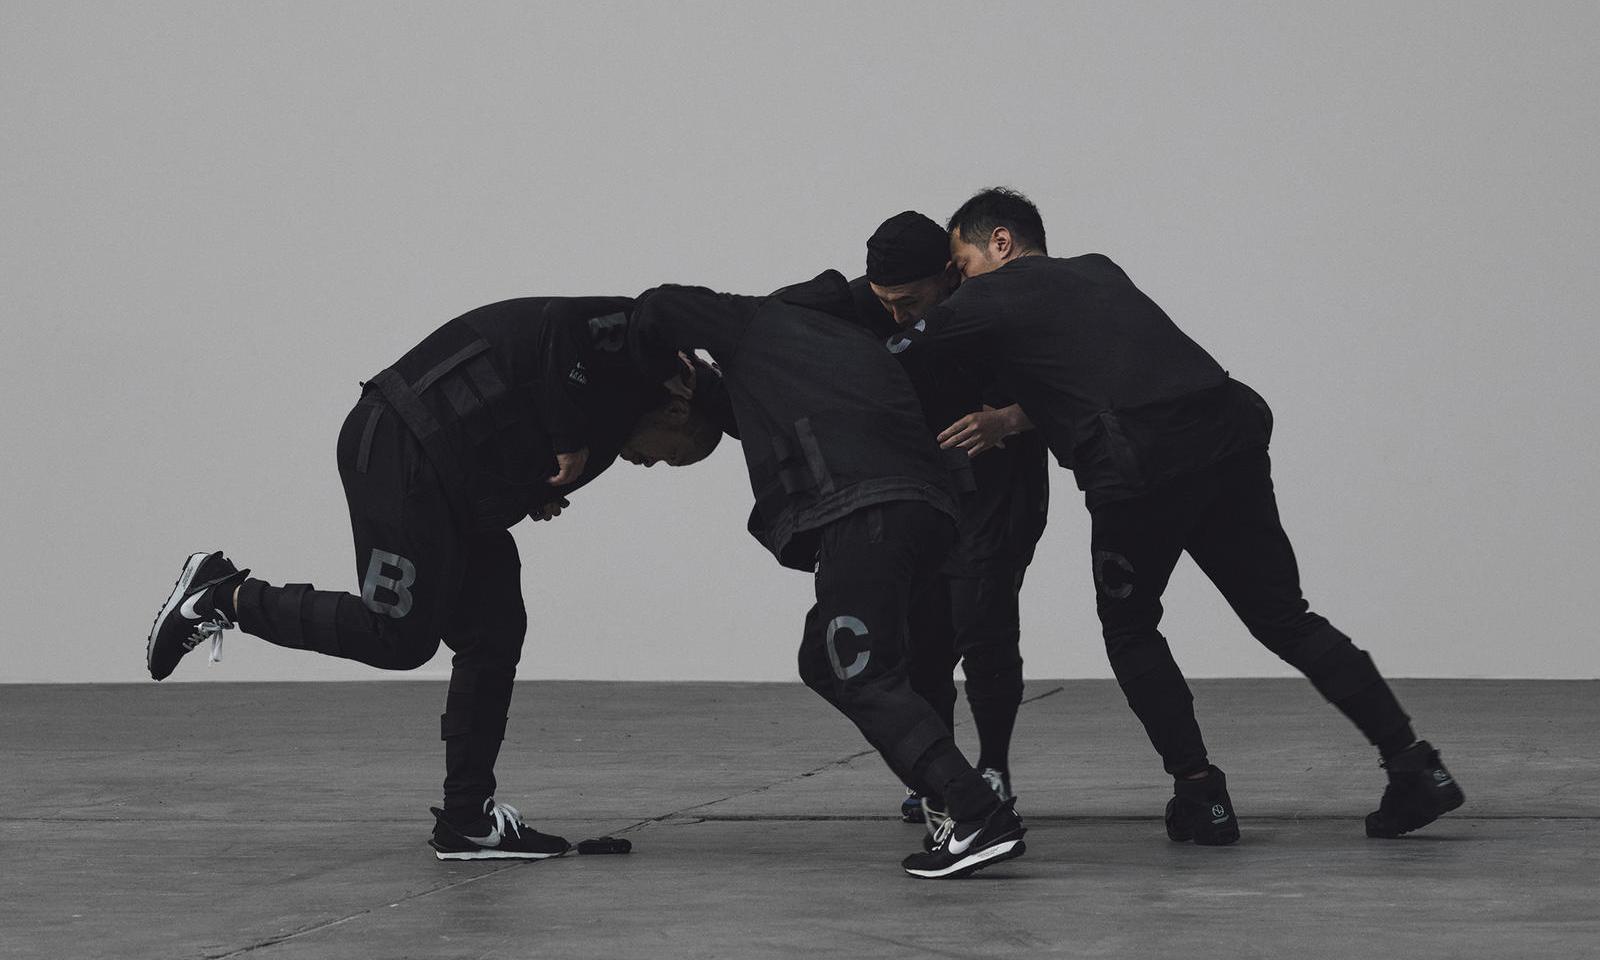 UNDERCOVER x Nike 2019 夏季联名系列释出